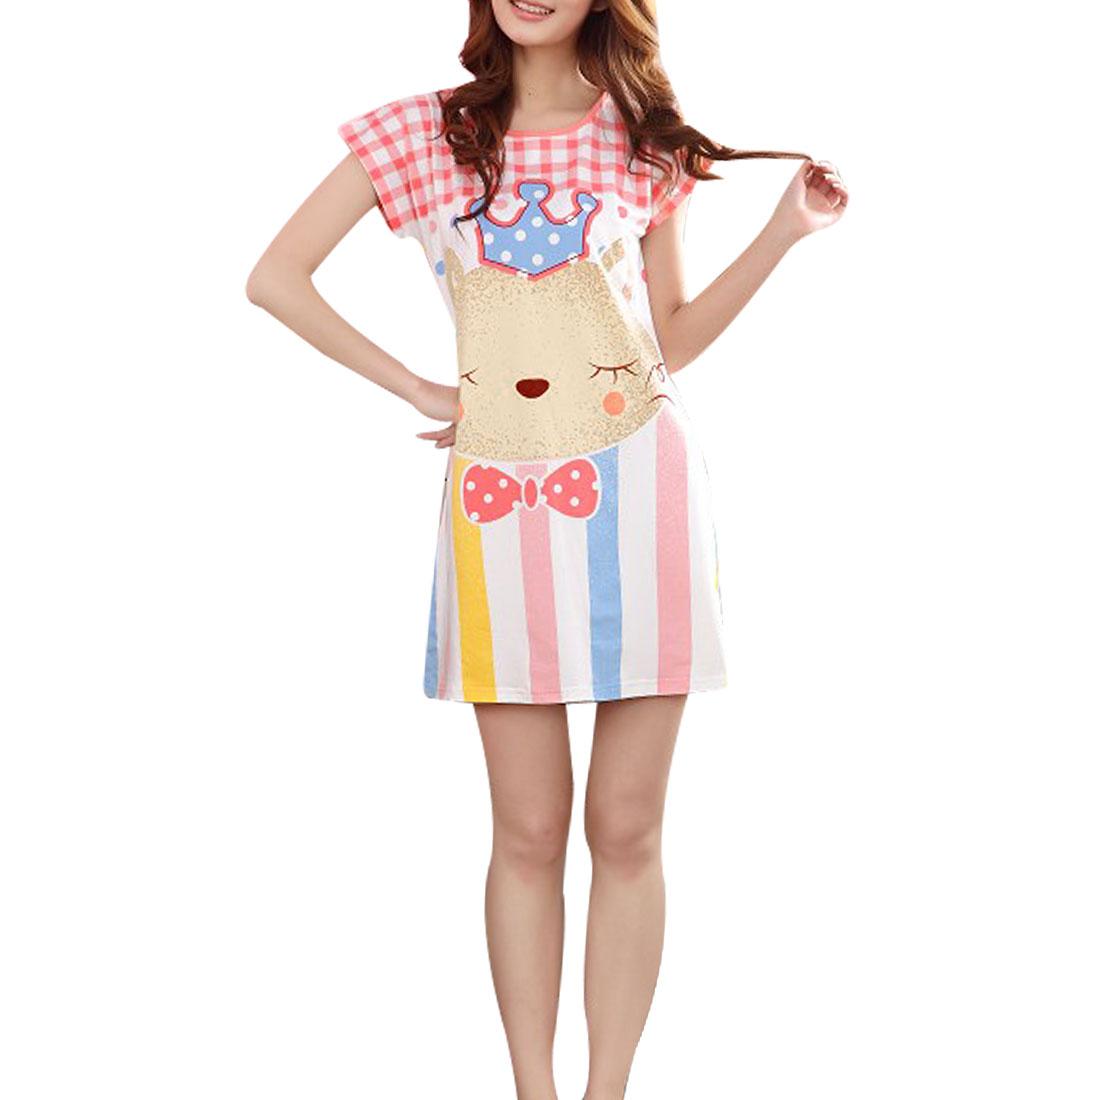 Lady Cartoon Pattern Short Sleeves Round Neck Sleep Dress Nightgow Pink White Beige XS